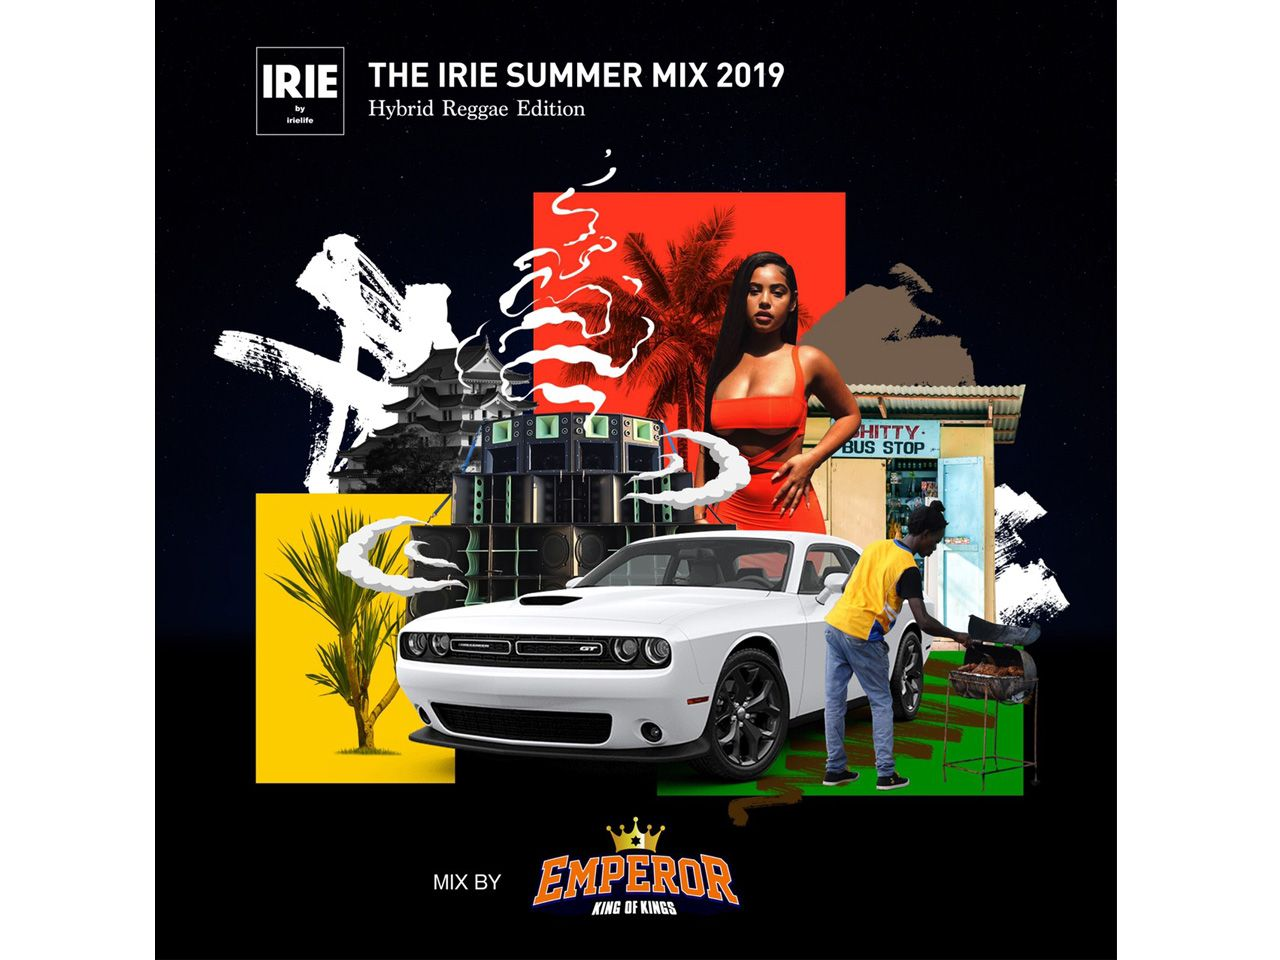 EMPEROR / THE IRIE SUMMER MIX 2019 -Hybrid Reggae Edition-